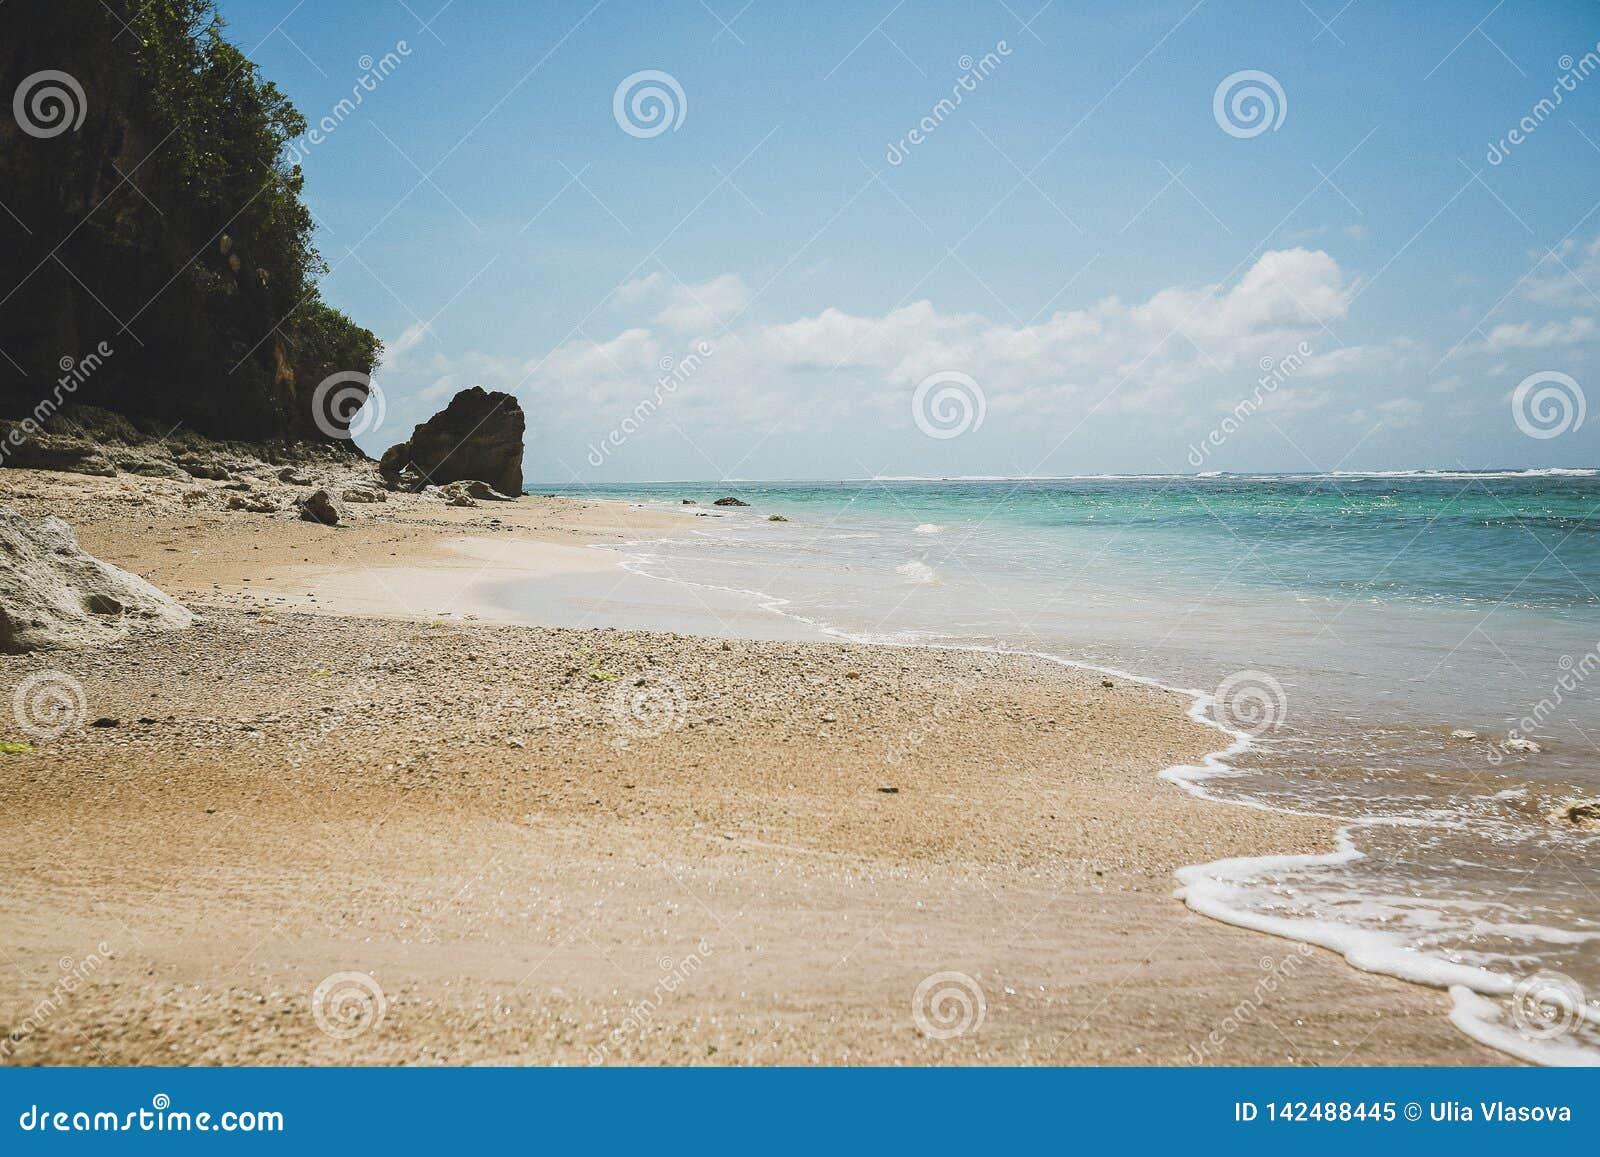 Verbazend gouden strand in Bali